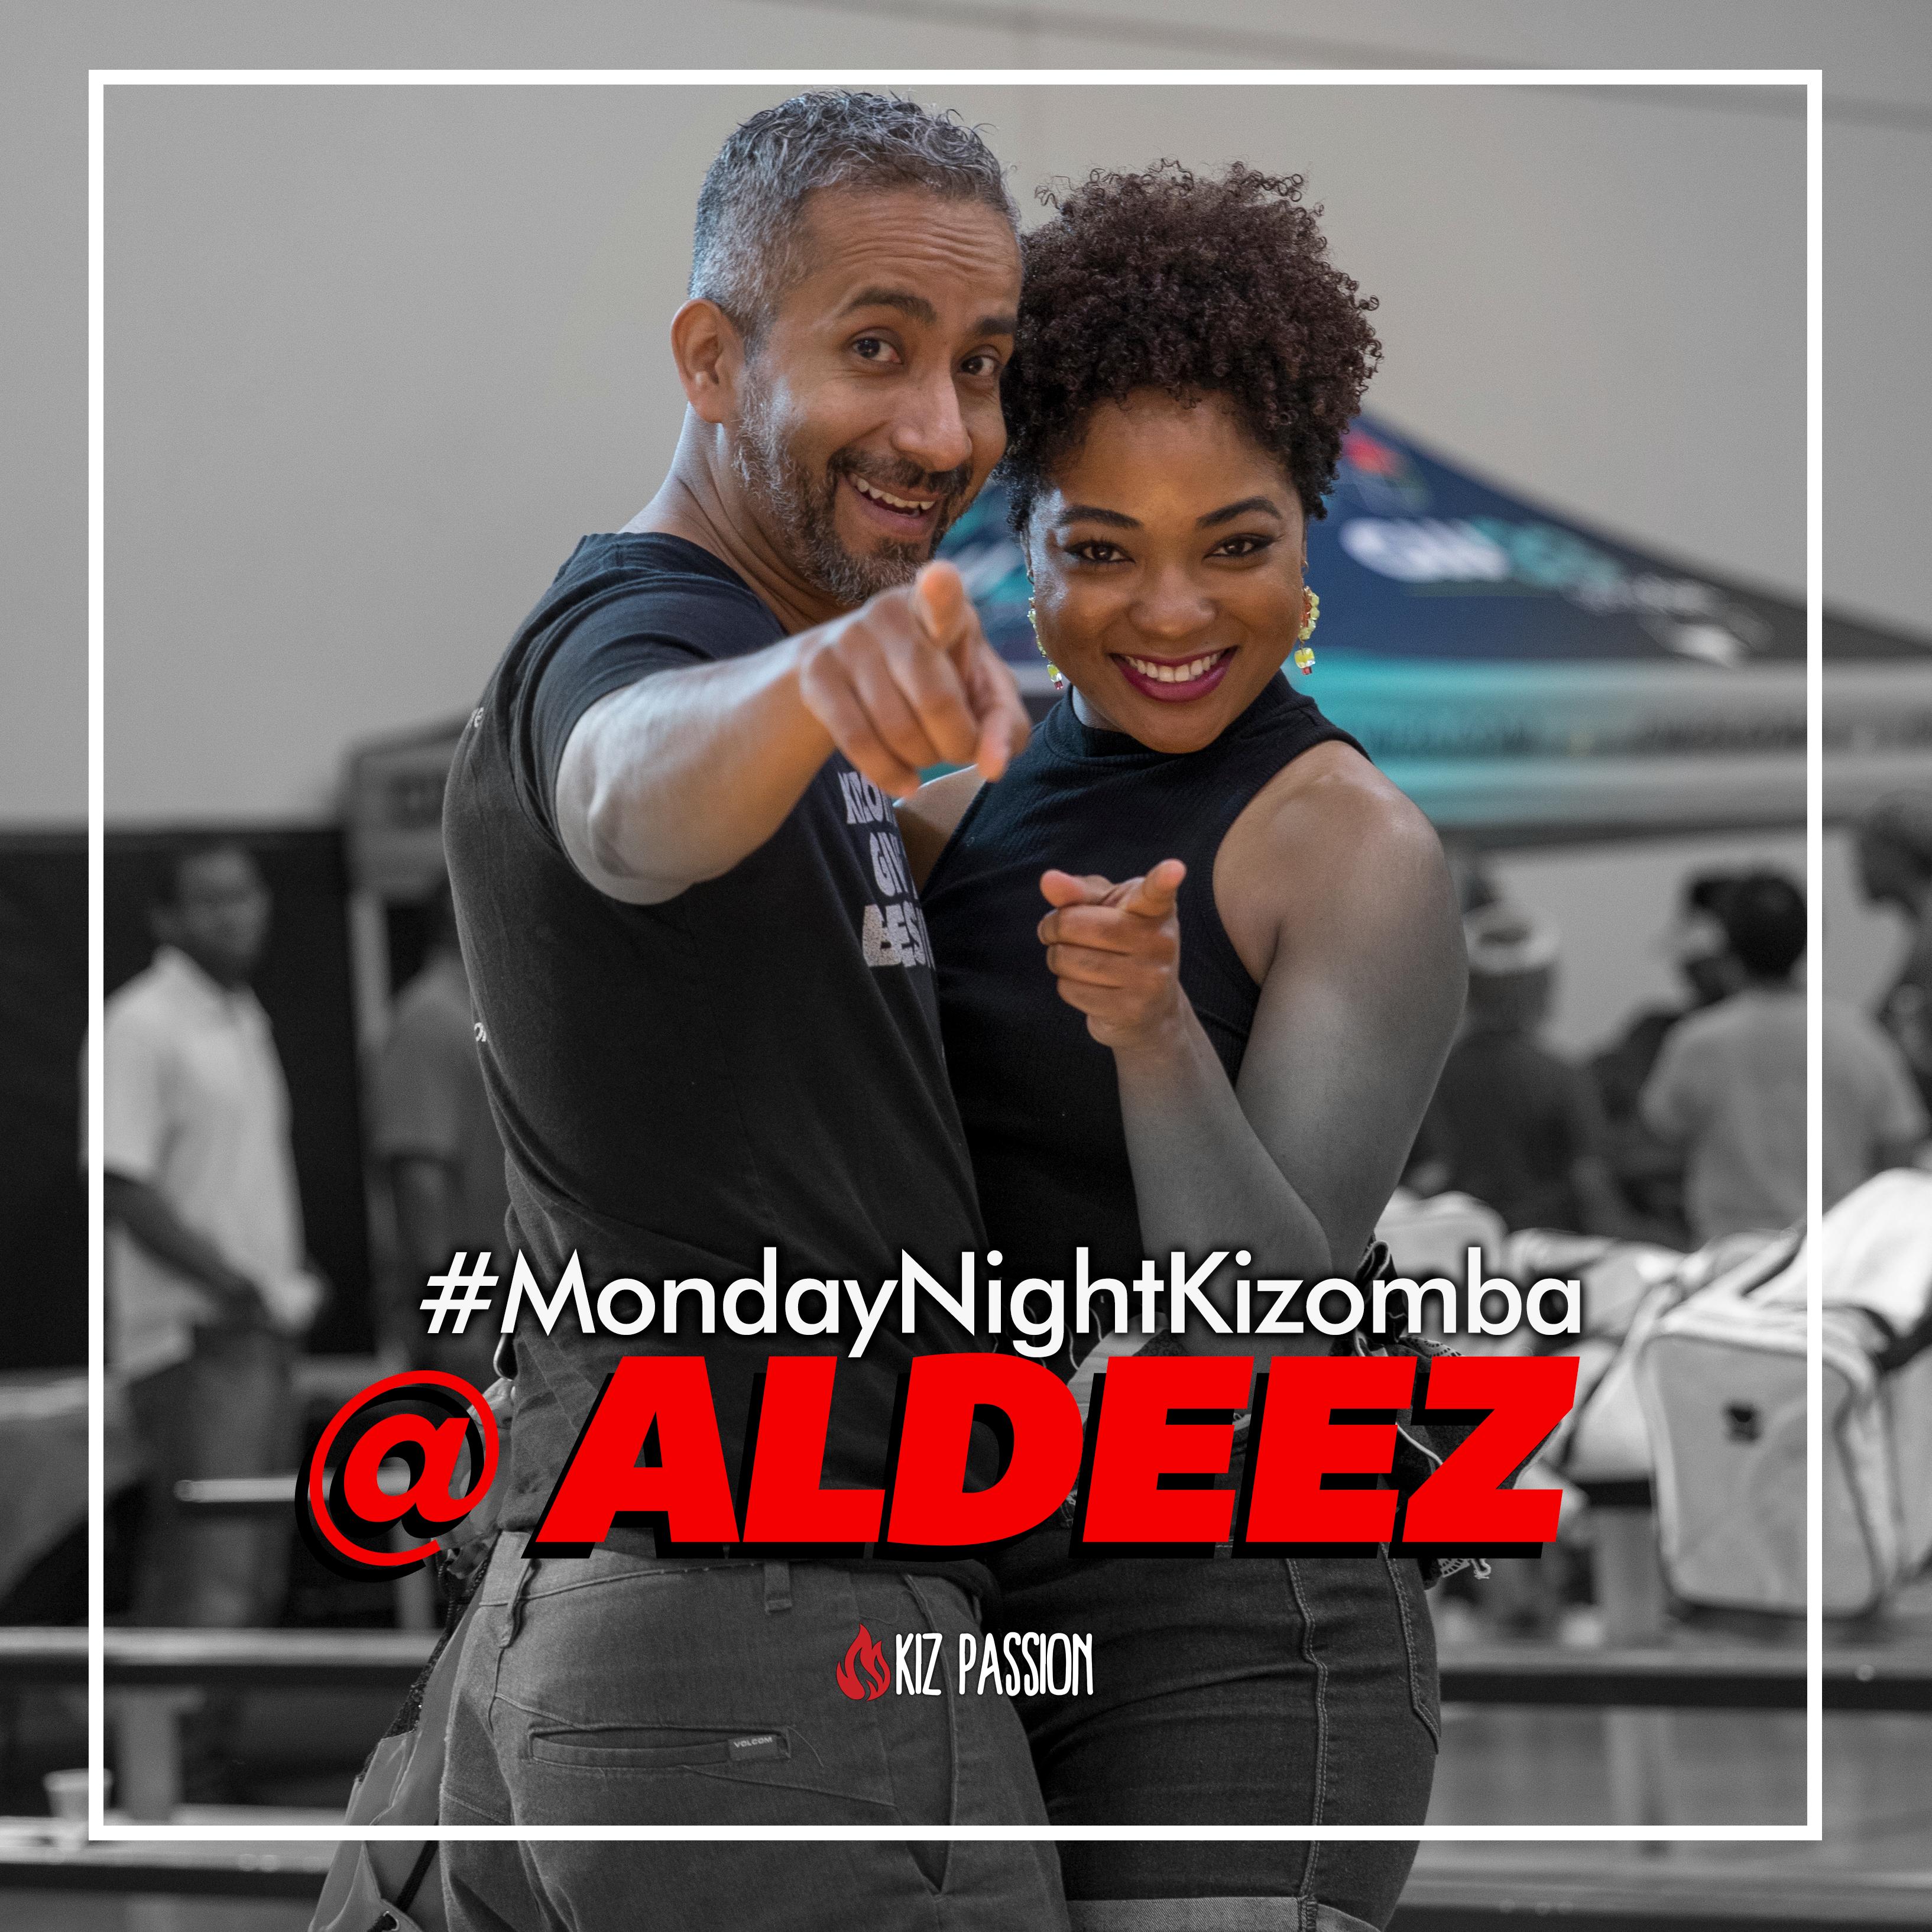 New Monday Night Kizomba Social Venue Reminder